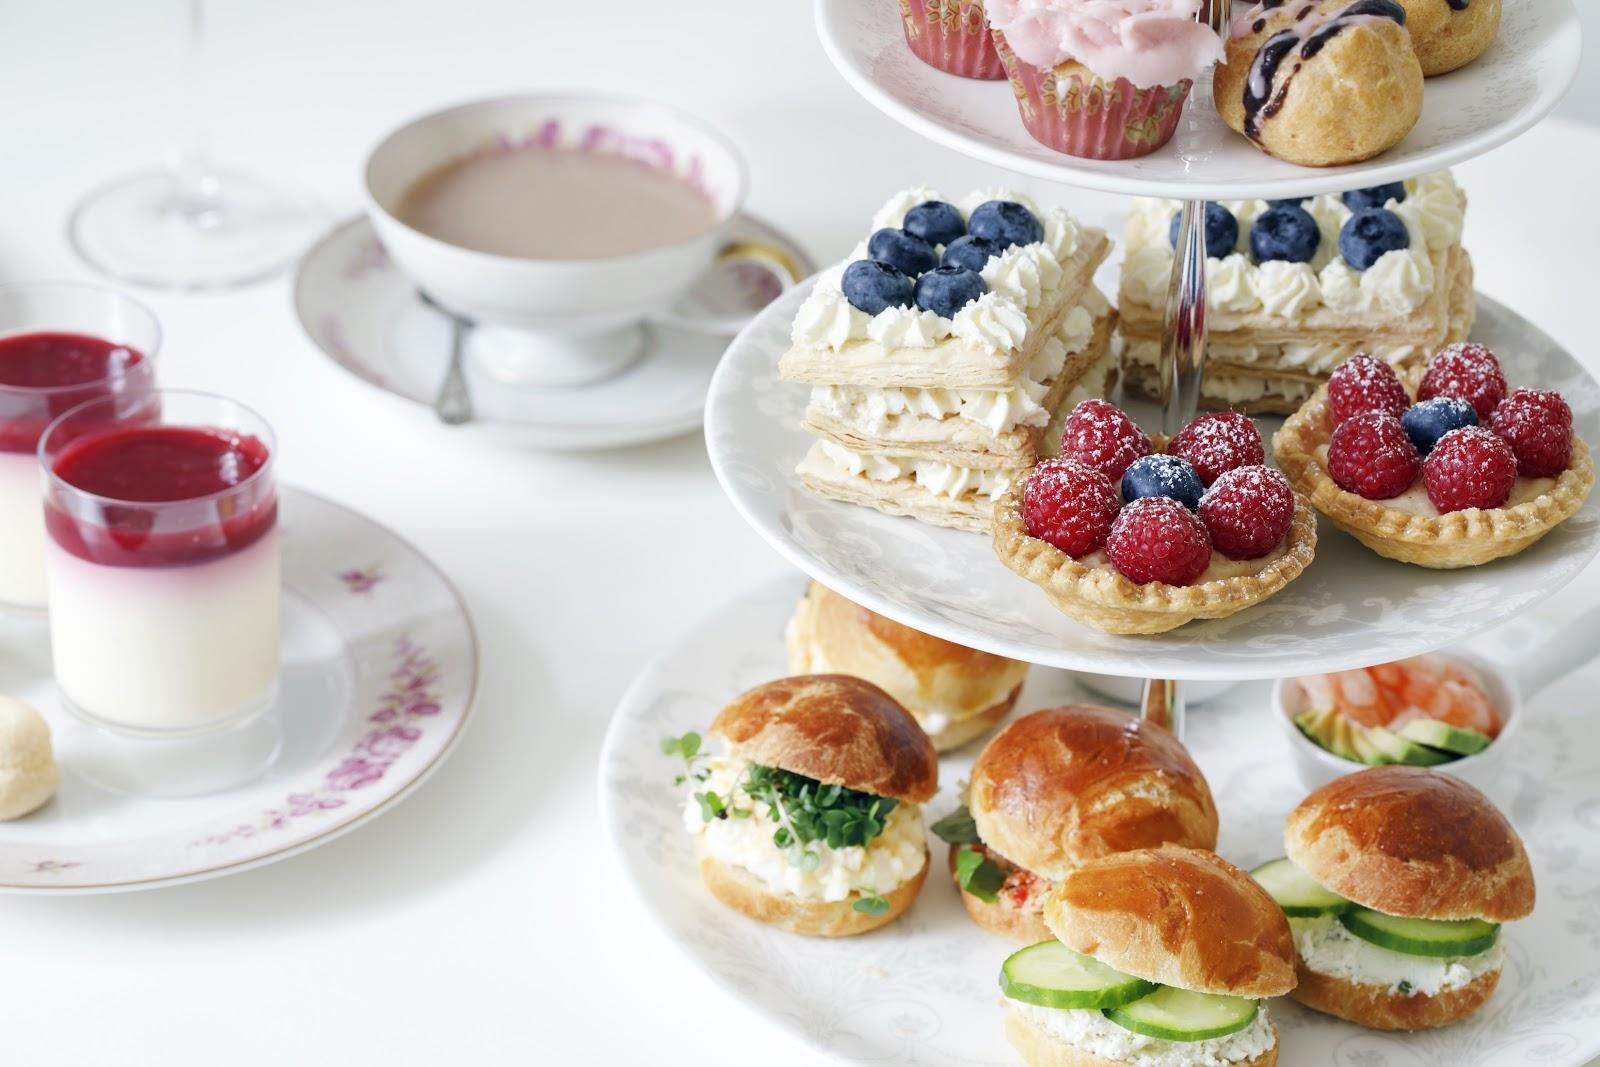 tea sandwiches: afternoon tea spread